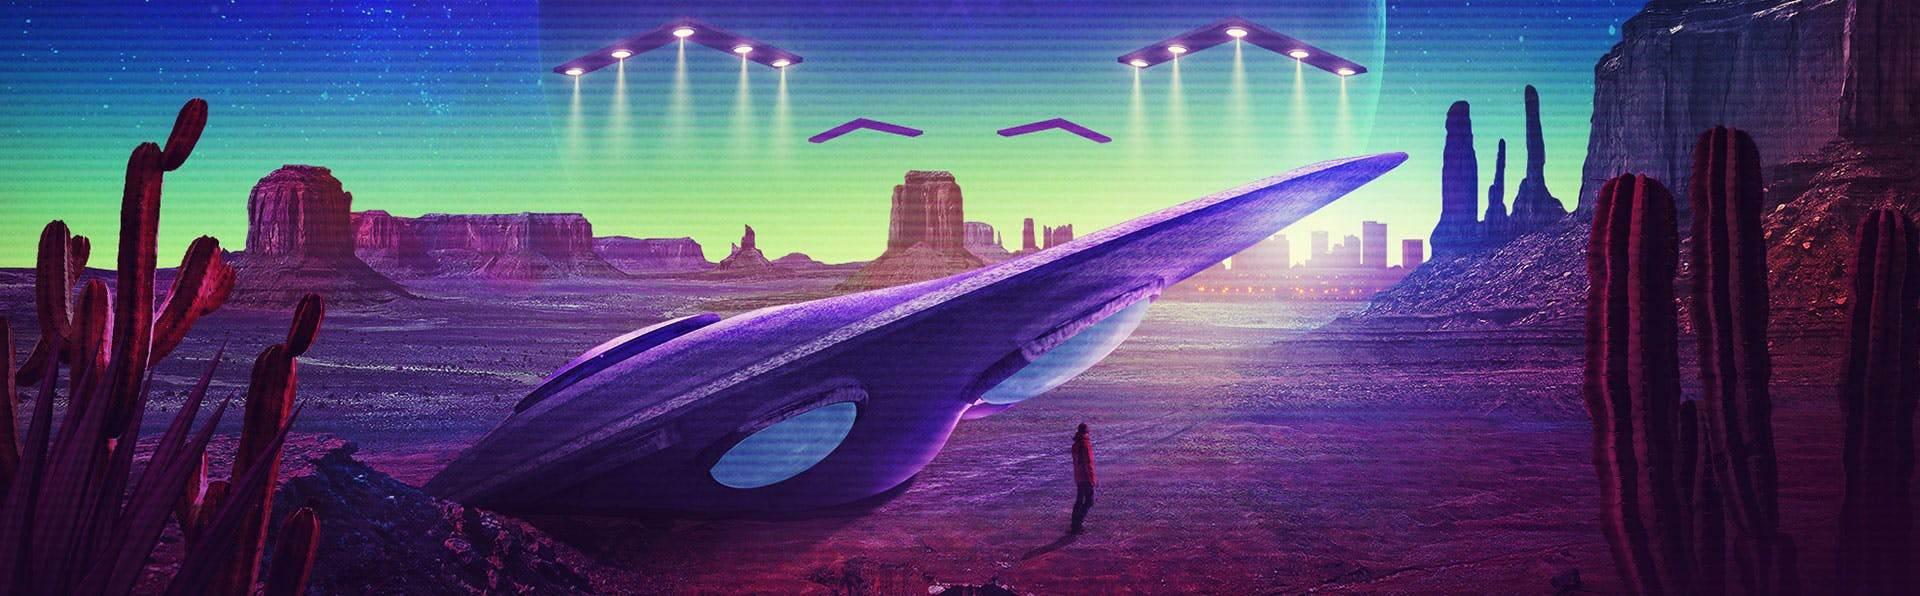 Phoenix Lights Festival 2021